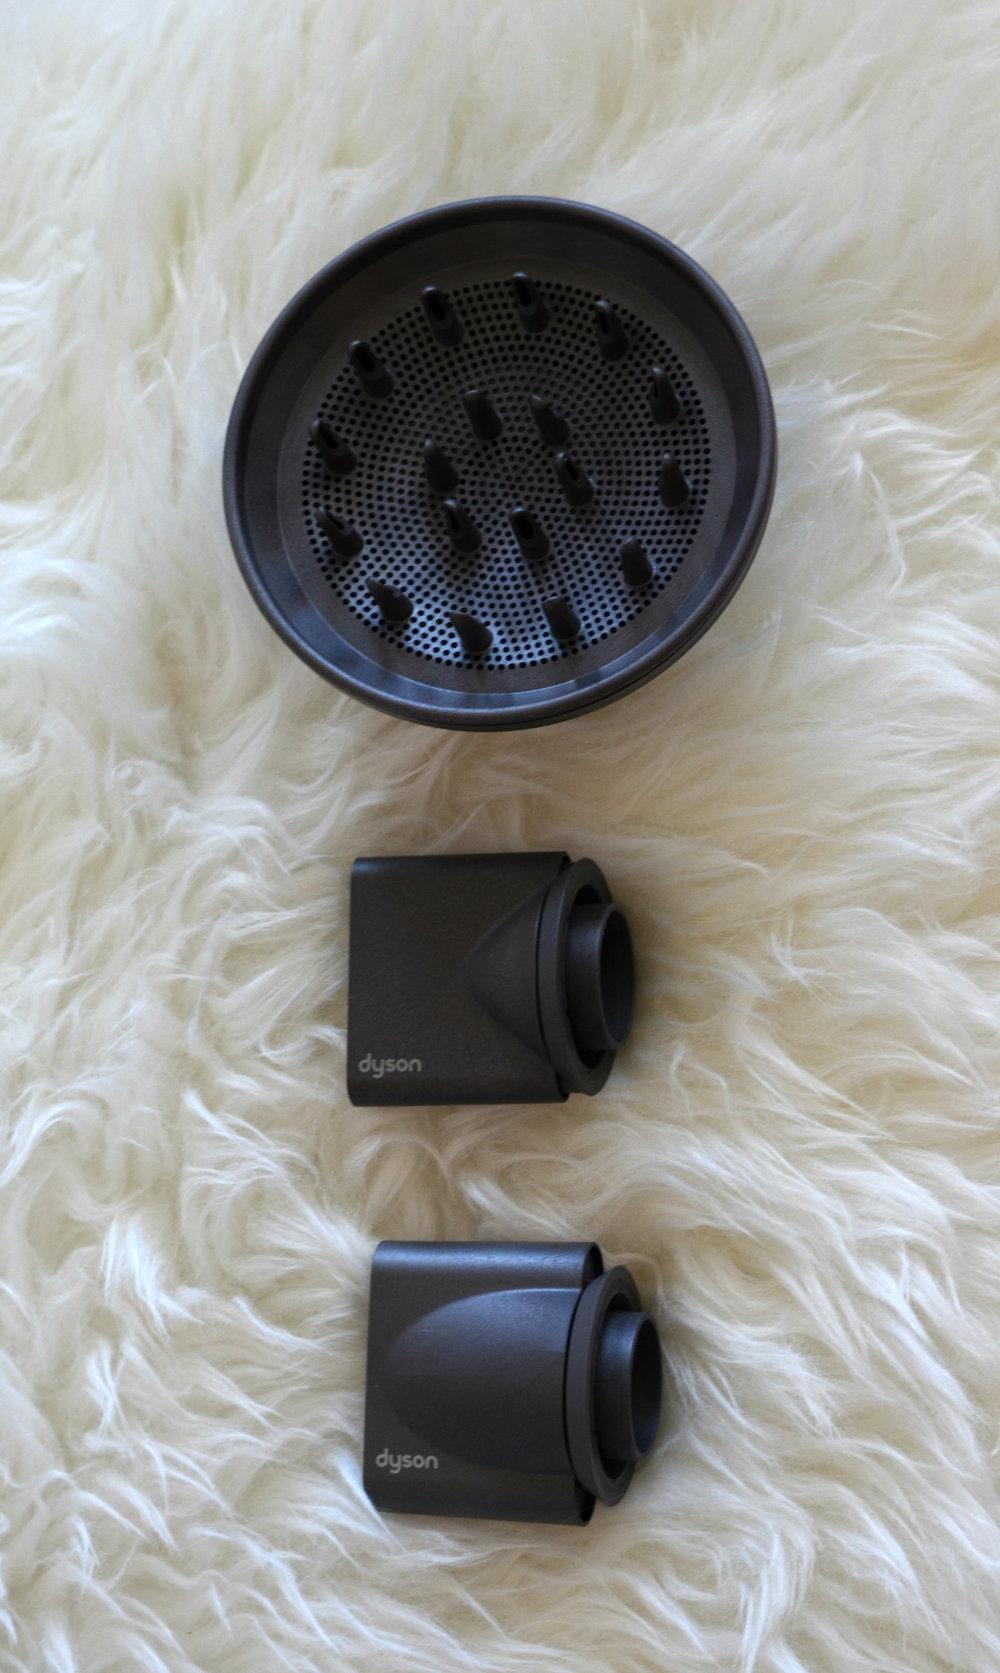 Dyson Supersonic hair dryer attachments